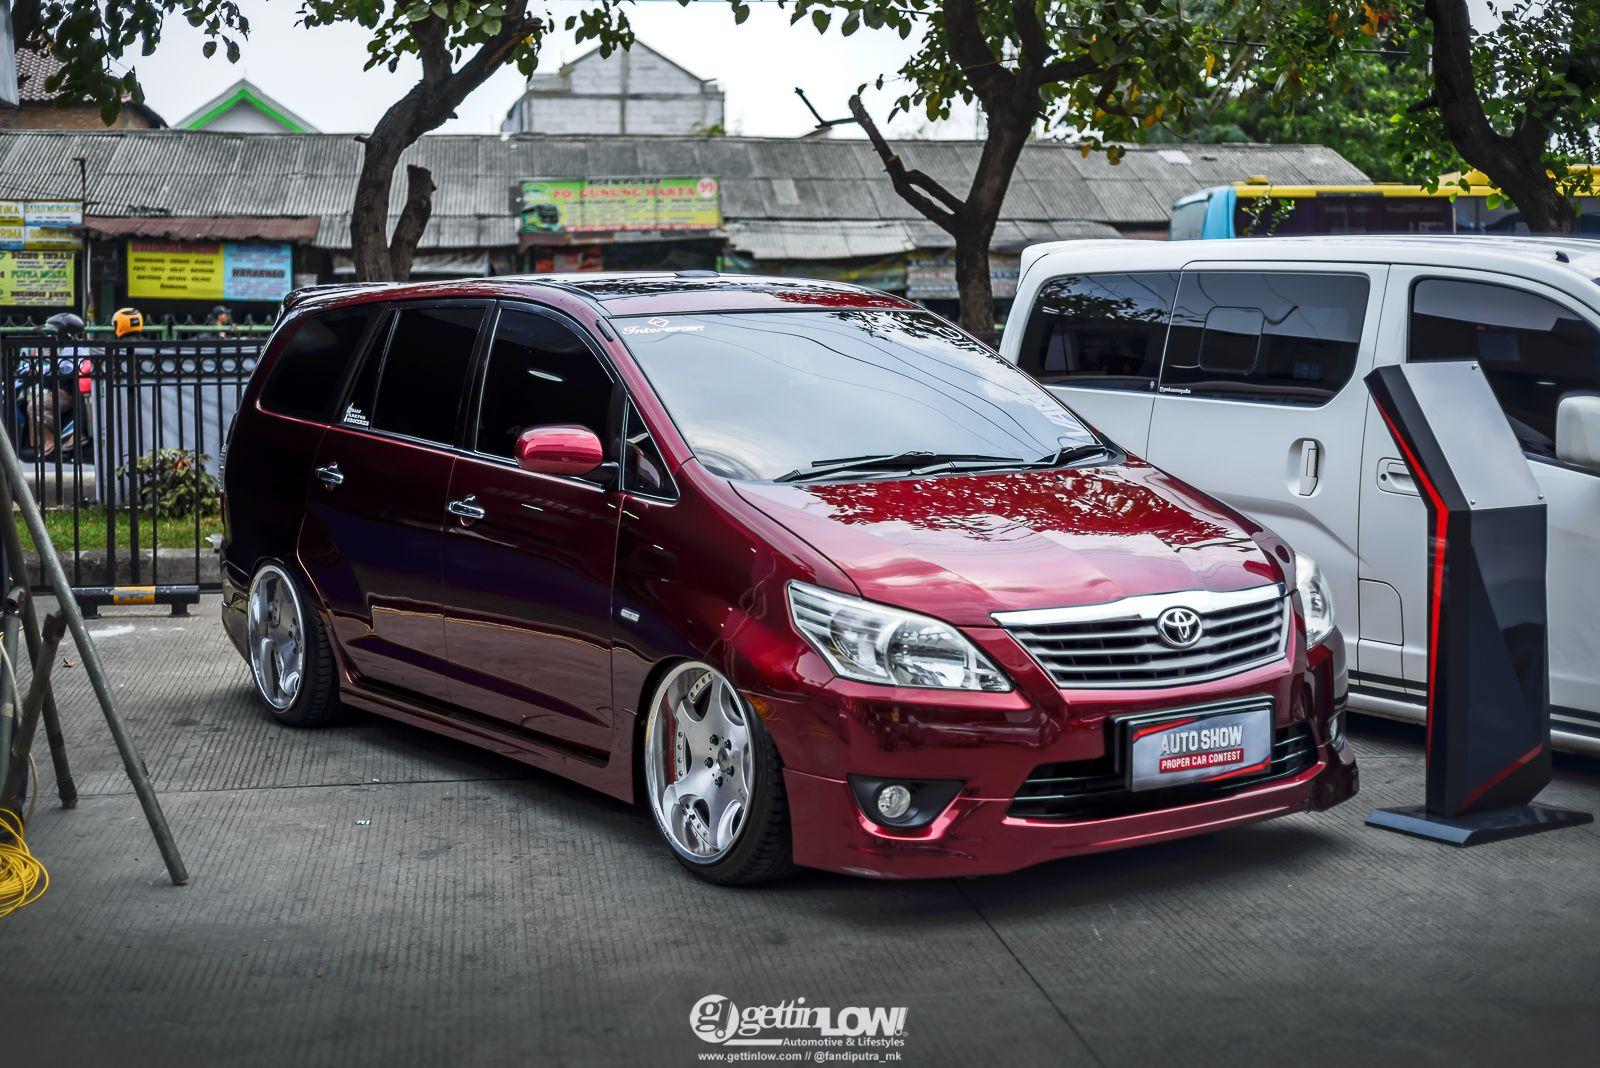 Intersport Autoshow Proper Car Contest 2018 Di Cimanggis Square Depok Modifikasi Mobil Mobil Retro